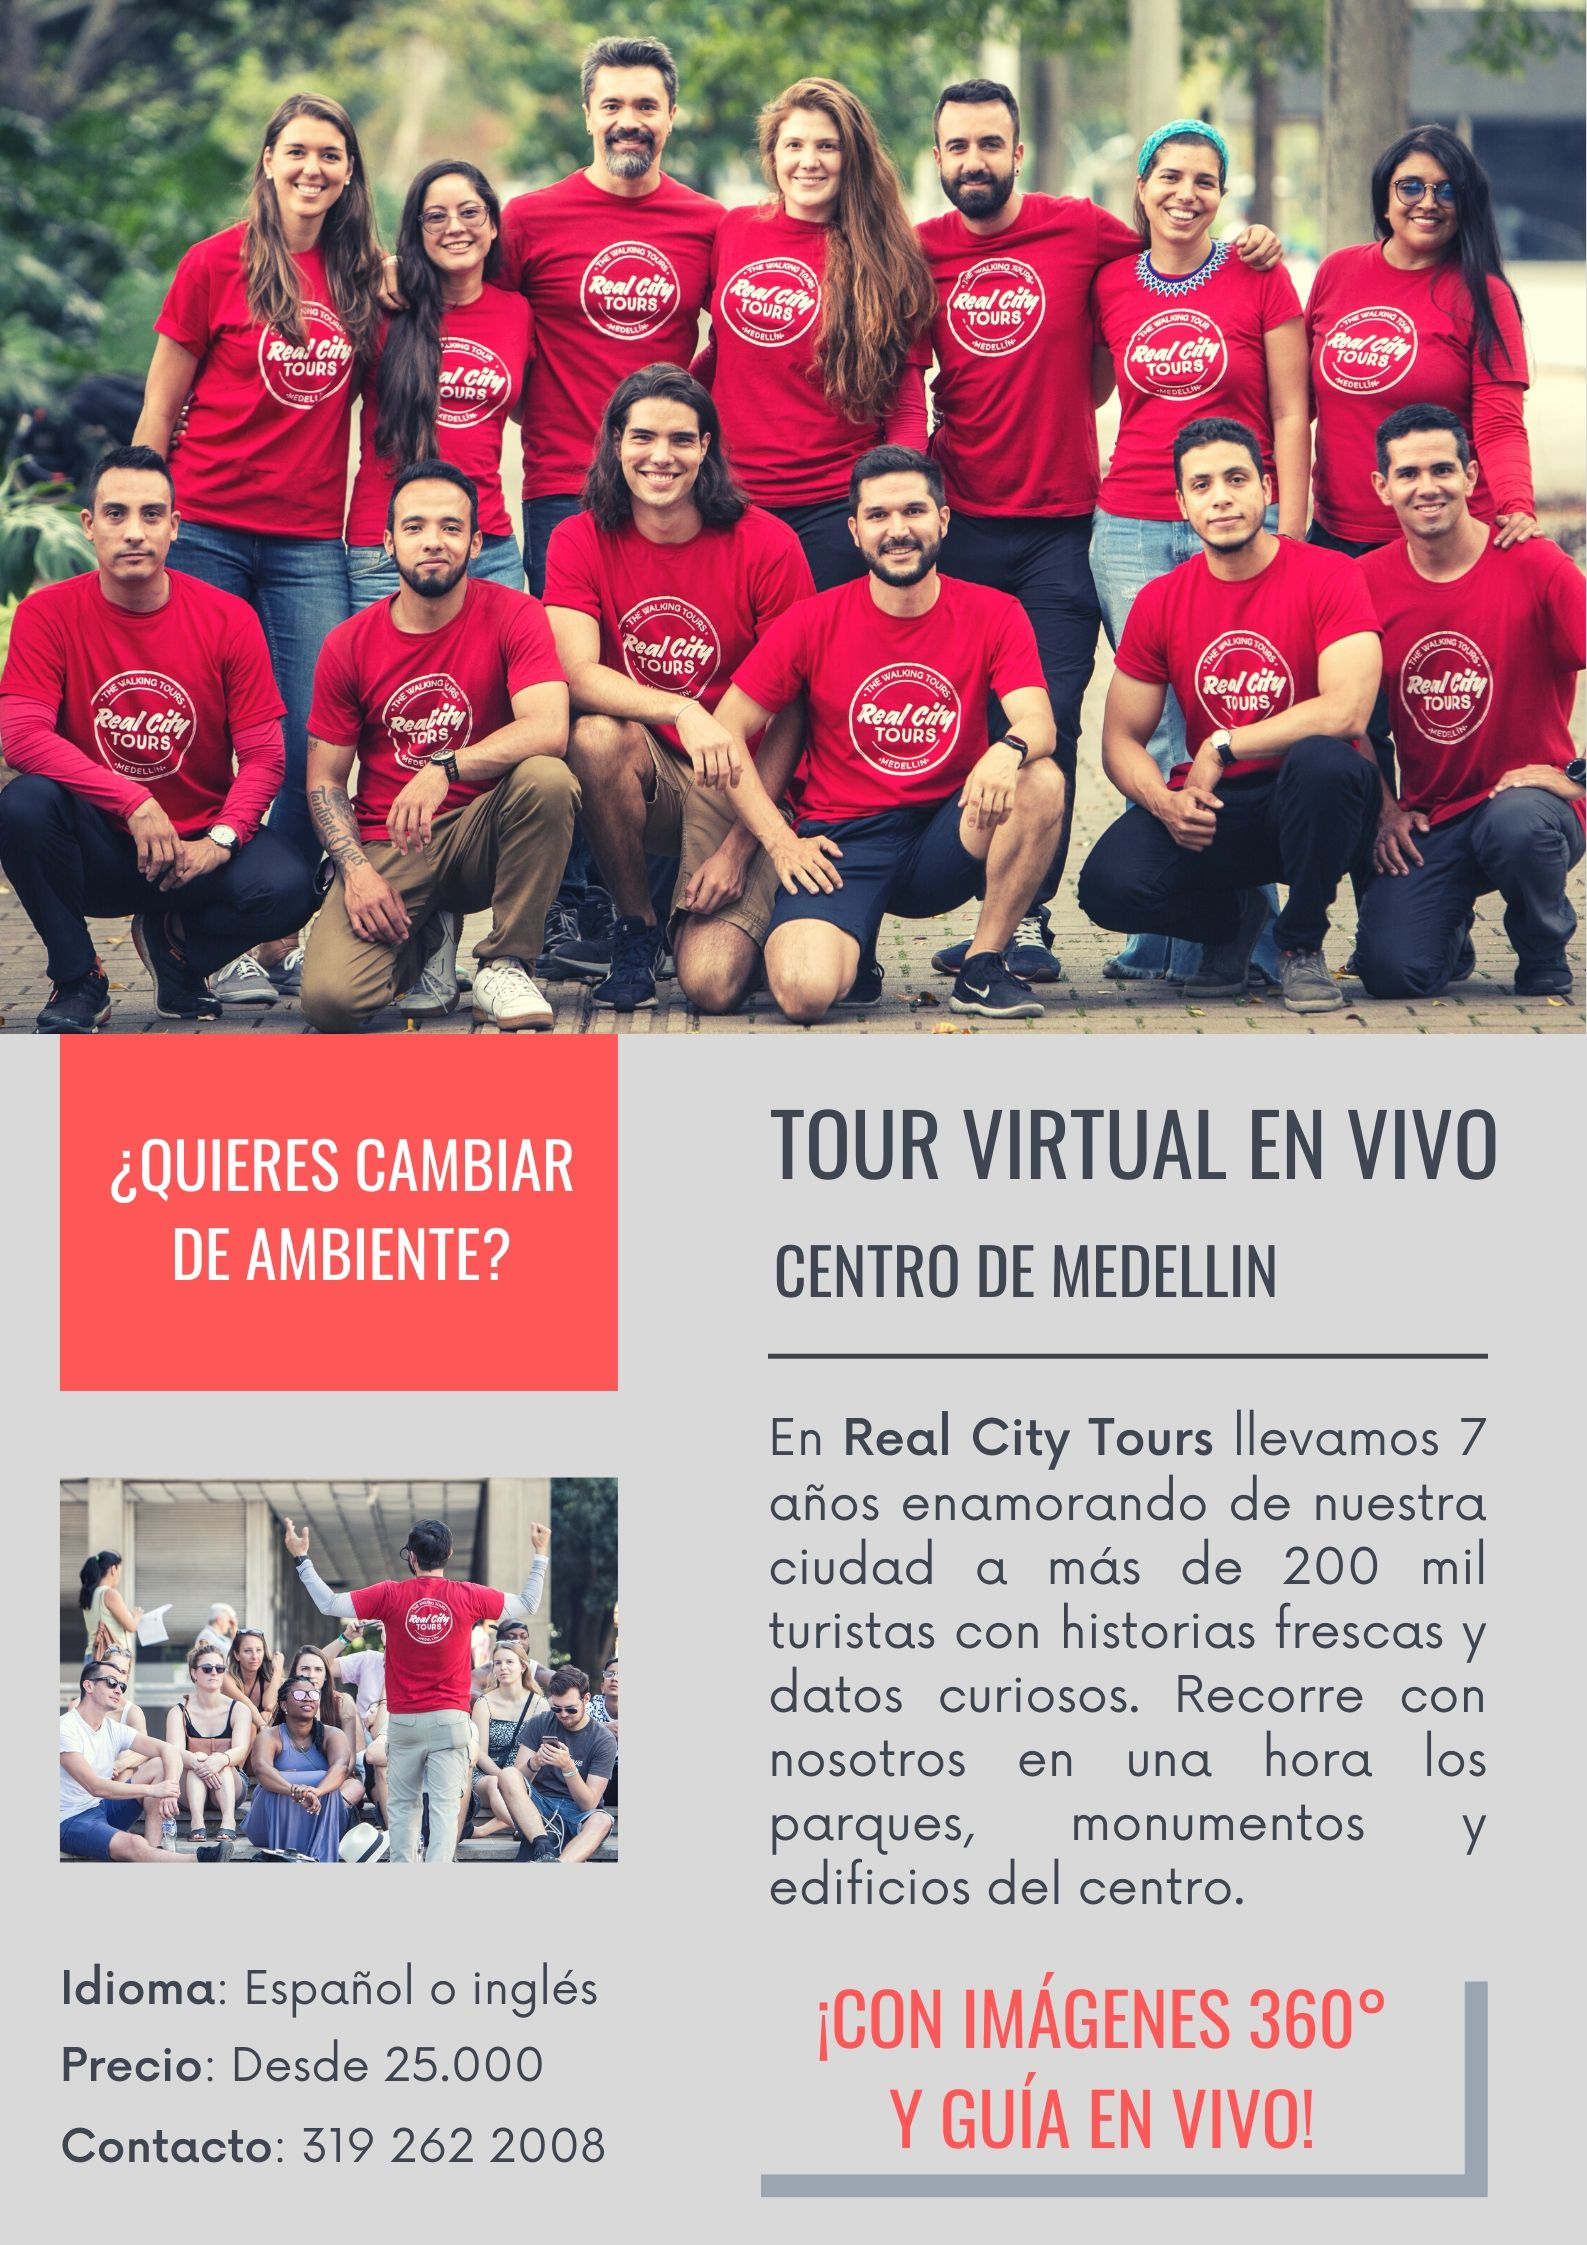 Tour virtual Medellín Real City Tours Medellin